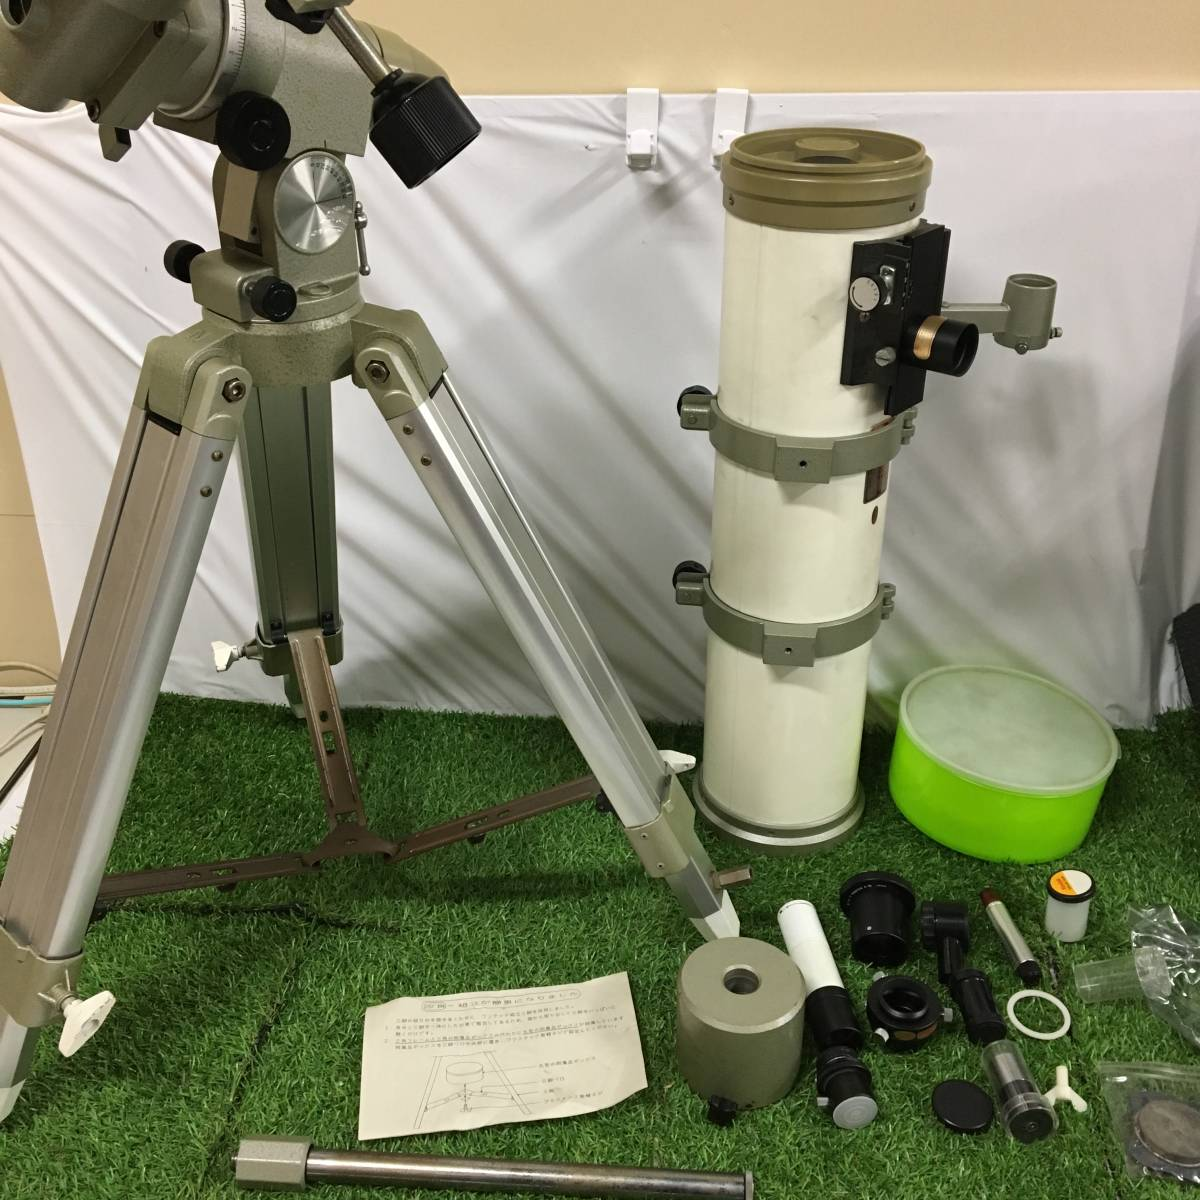 Vixen ASTRONOMICAL TELESCOPE スーパーポラリス・R-100S 天体望遠鏡